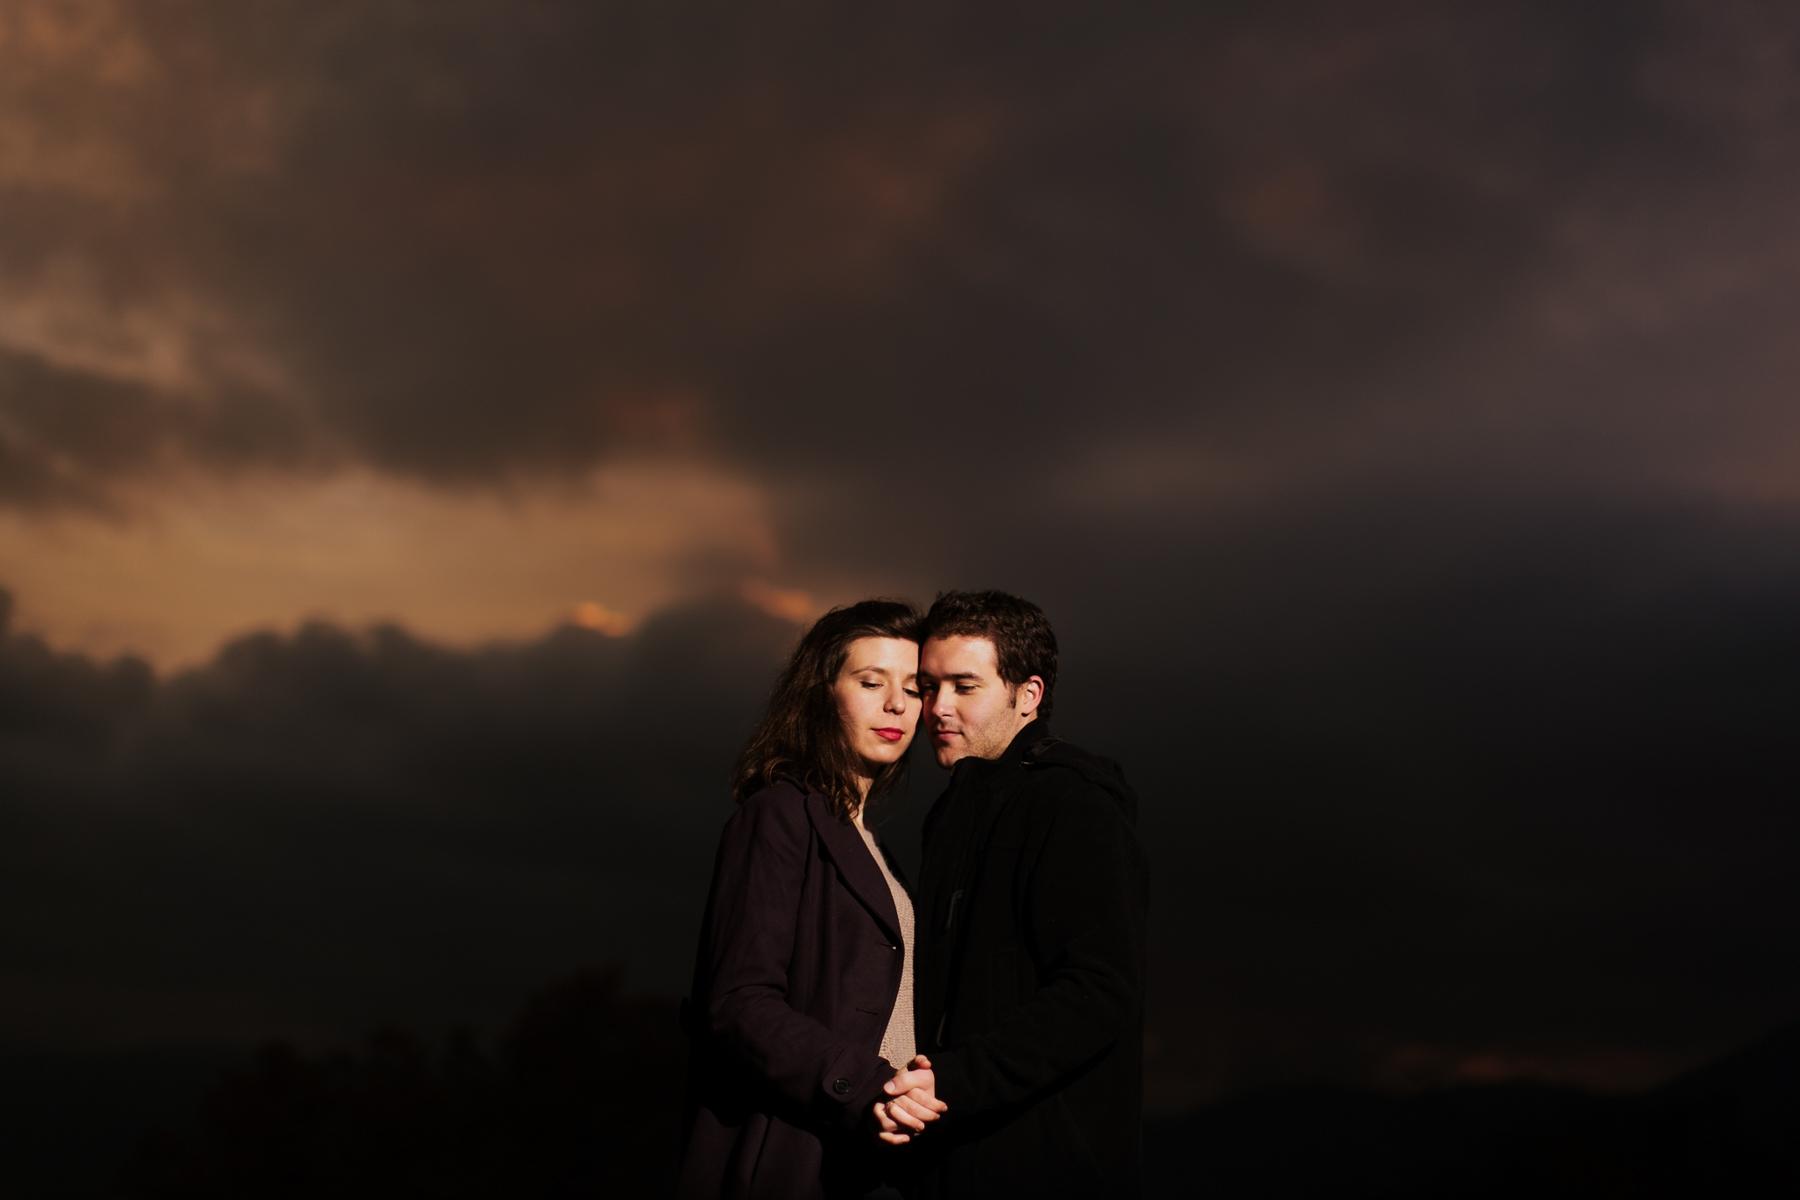 fotografo de bodas Jairo Crena-183